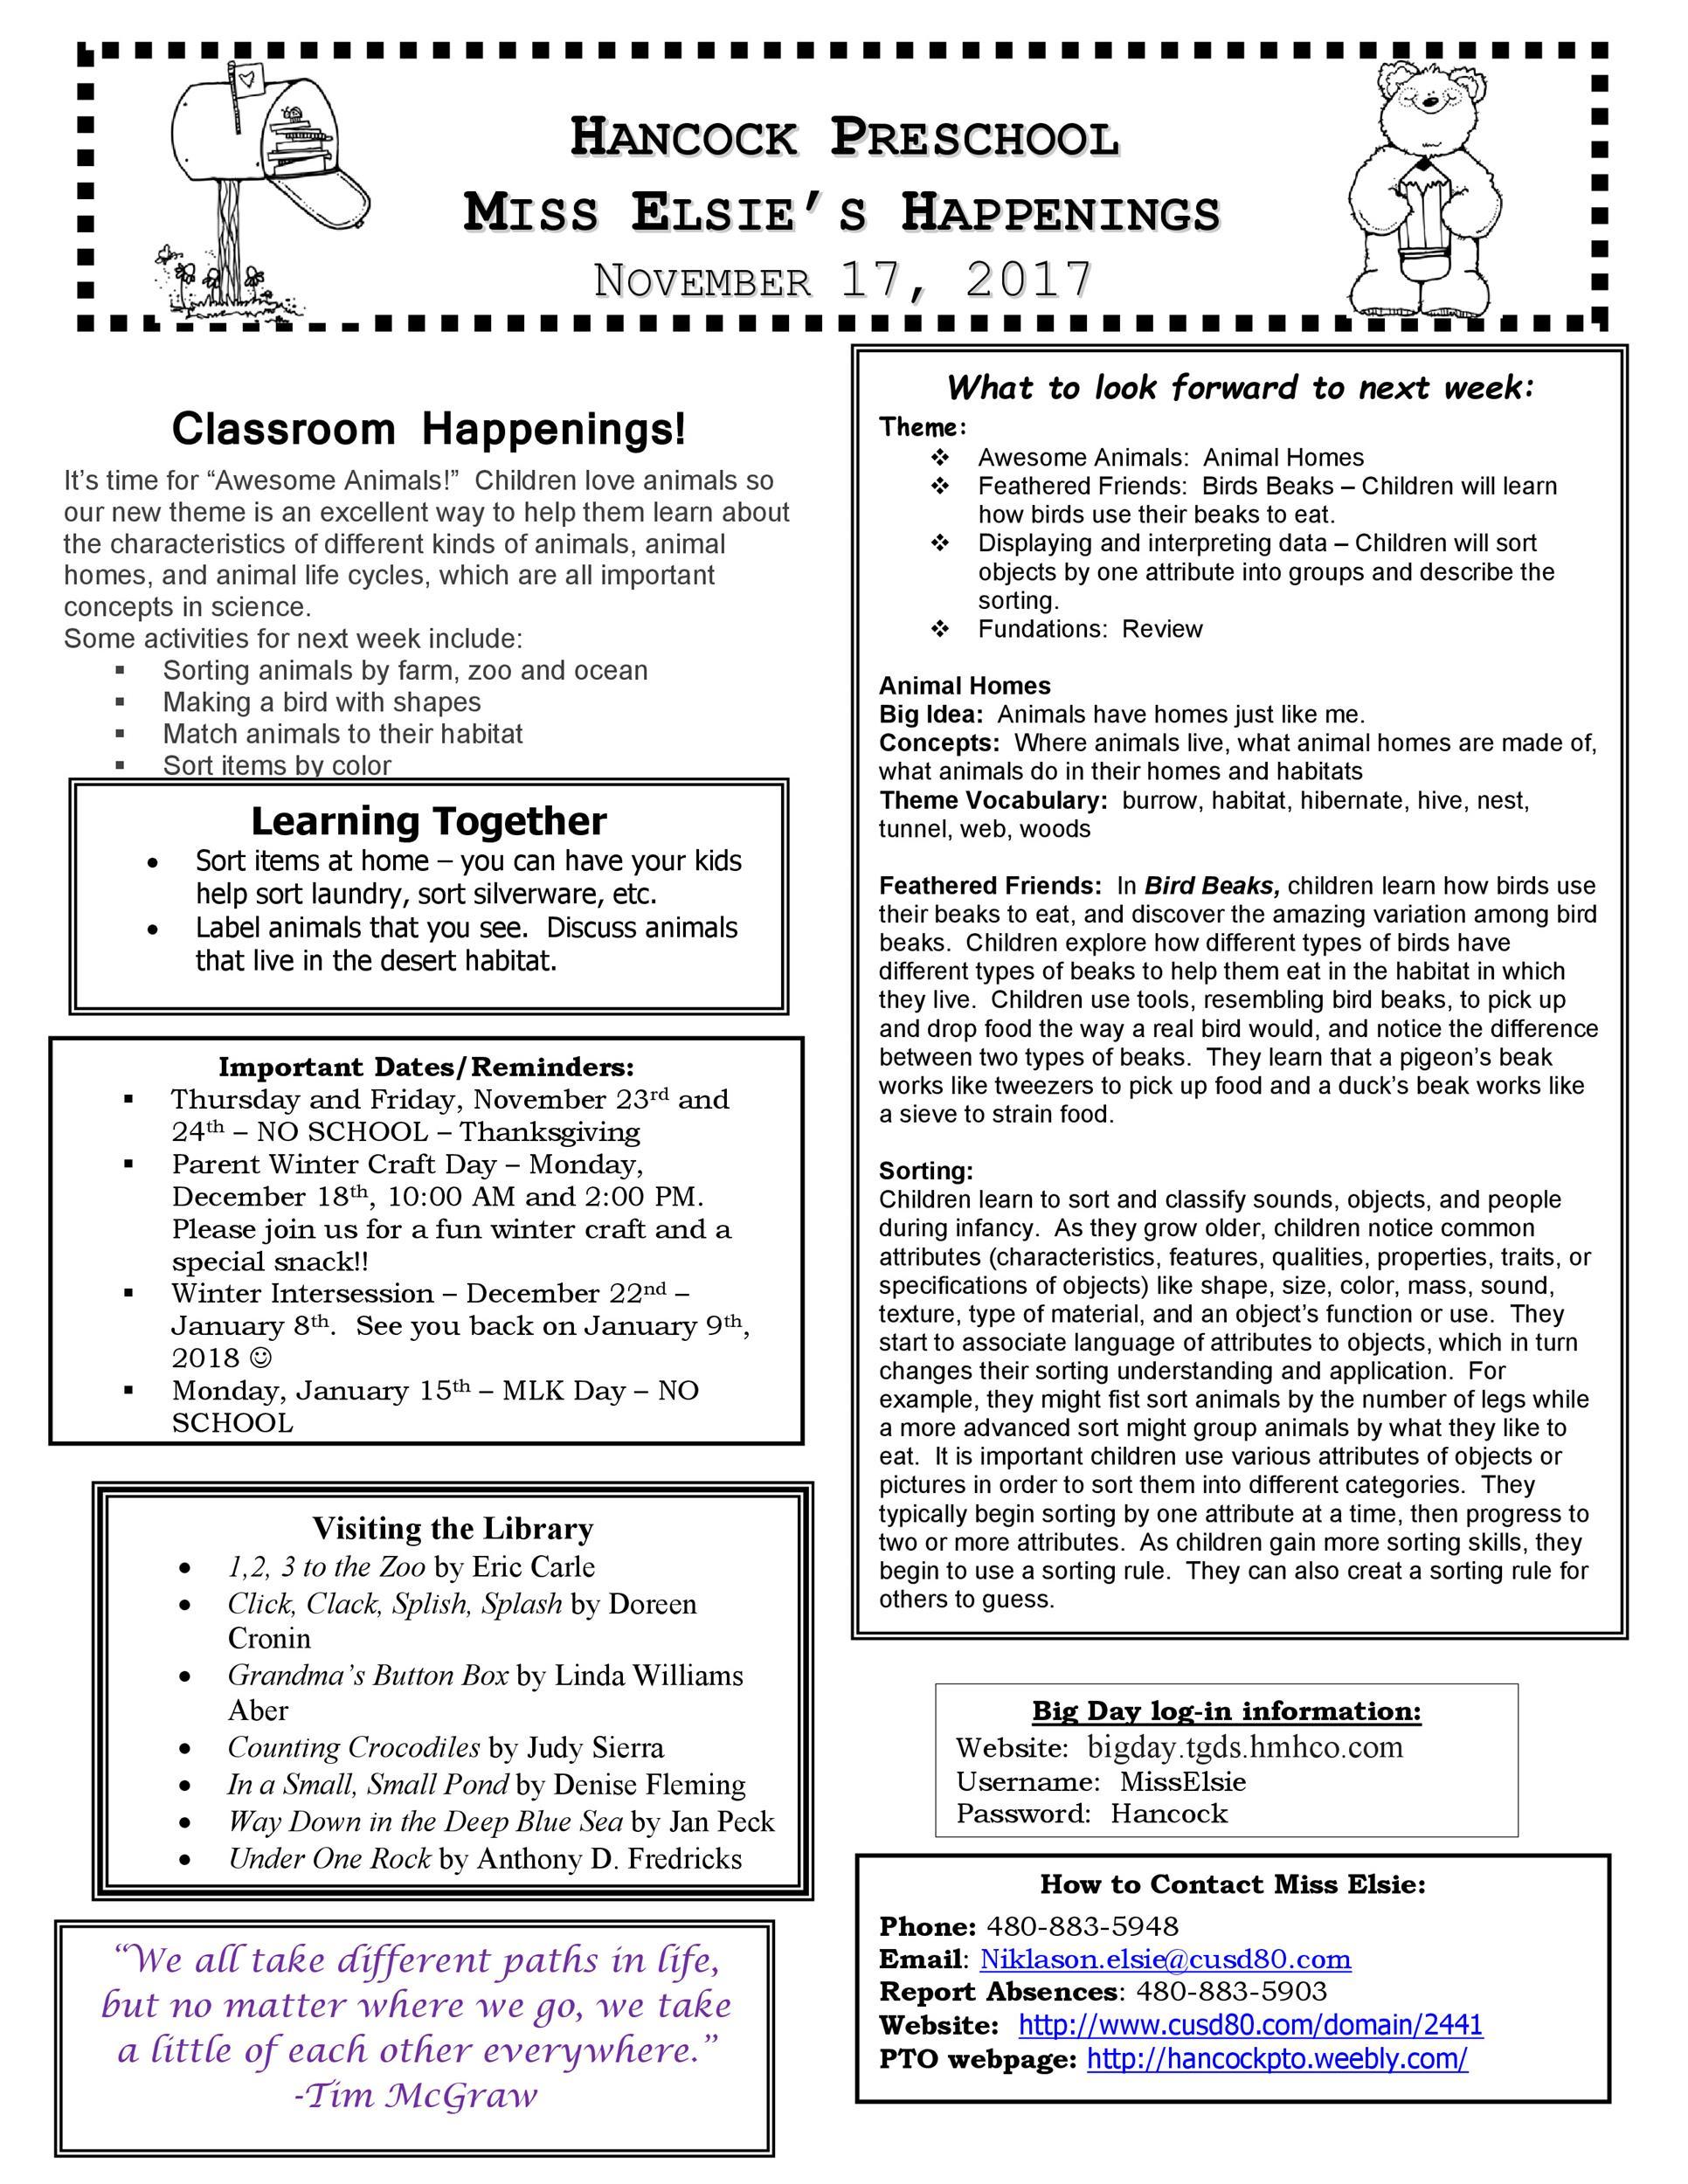 Free preschool newsletter template 02